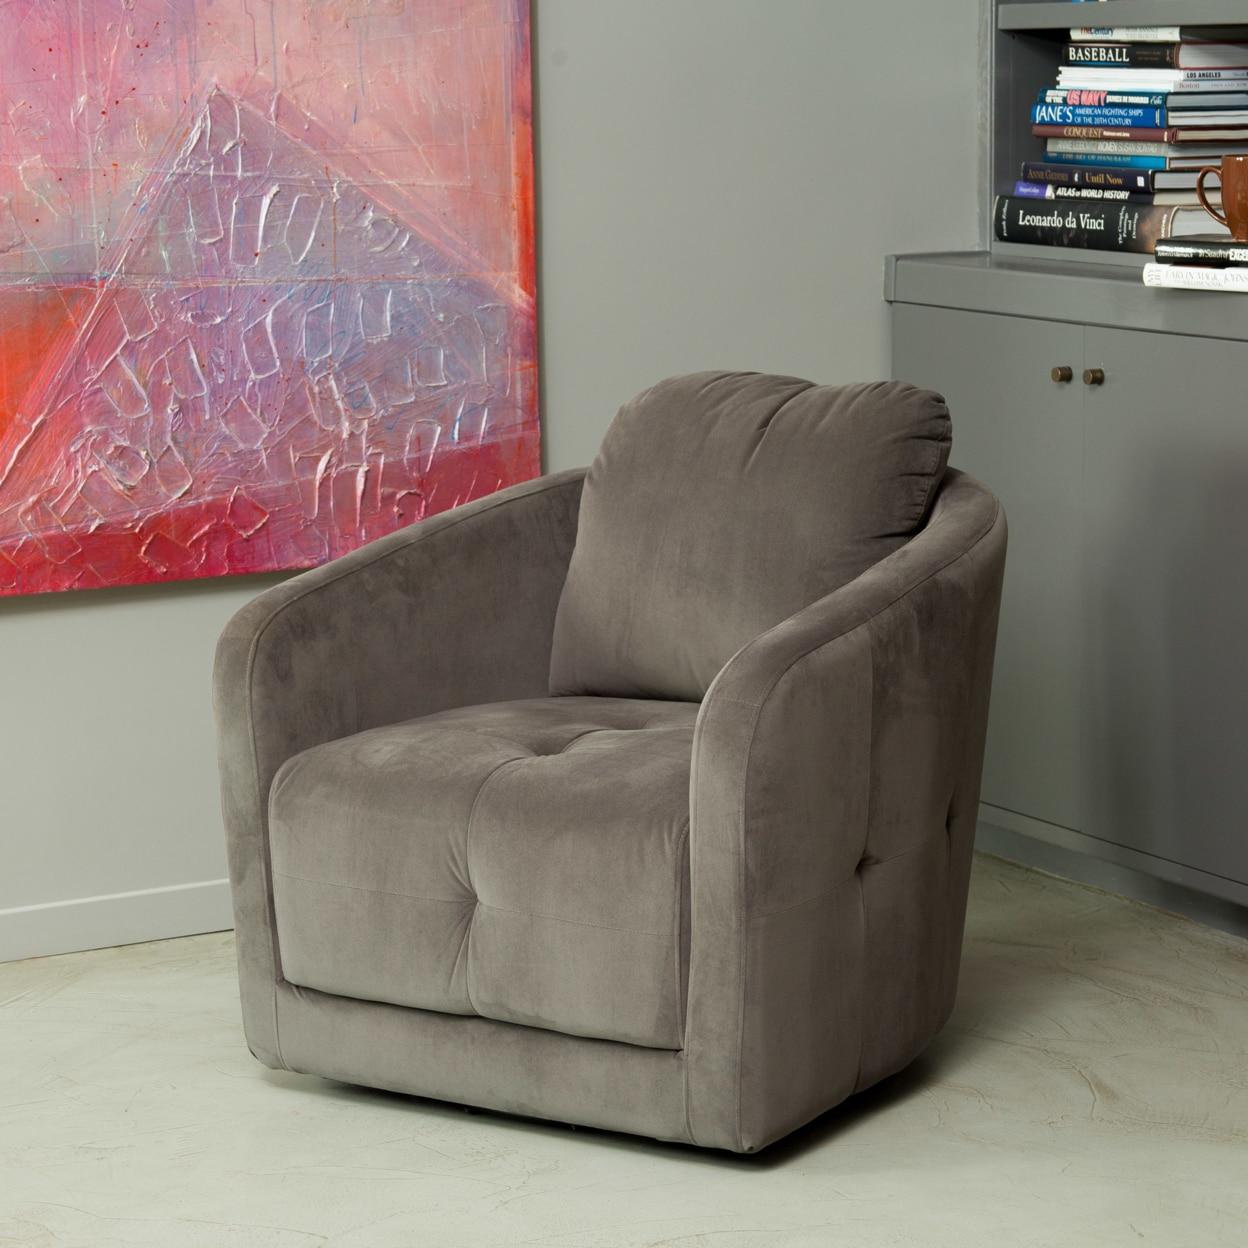 Bernhoft Swivel Grey Microfiber Fabric Armchair-in Living